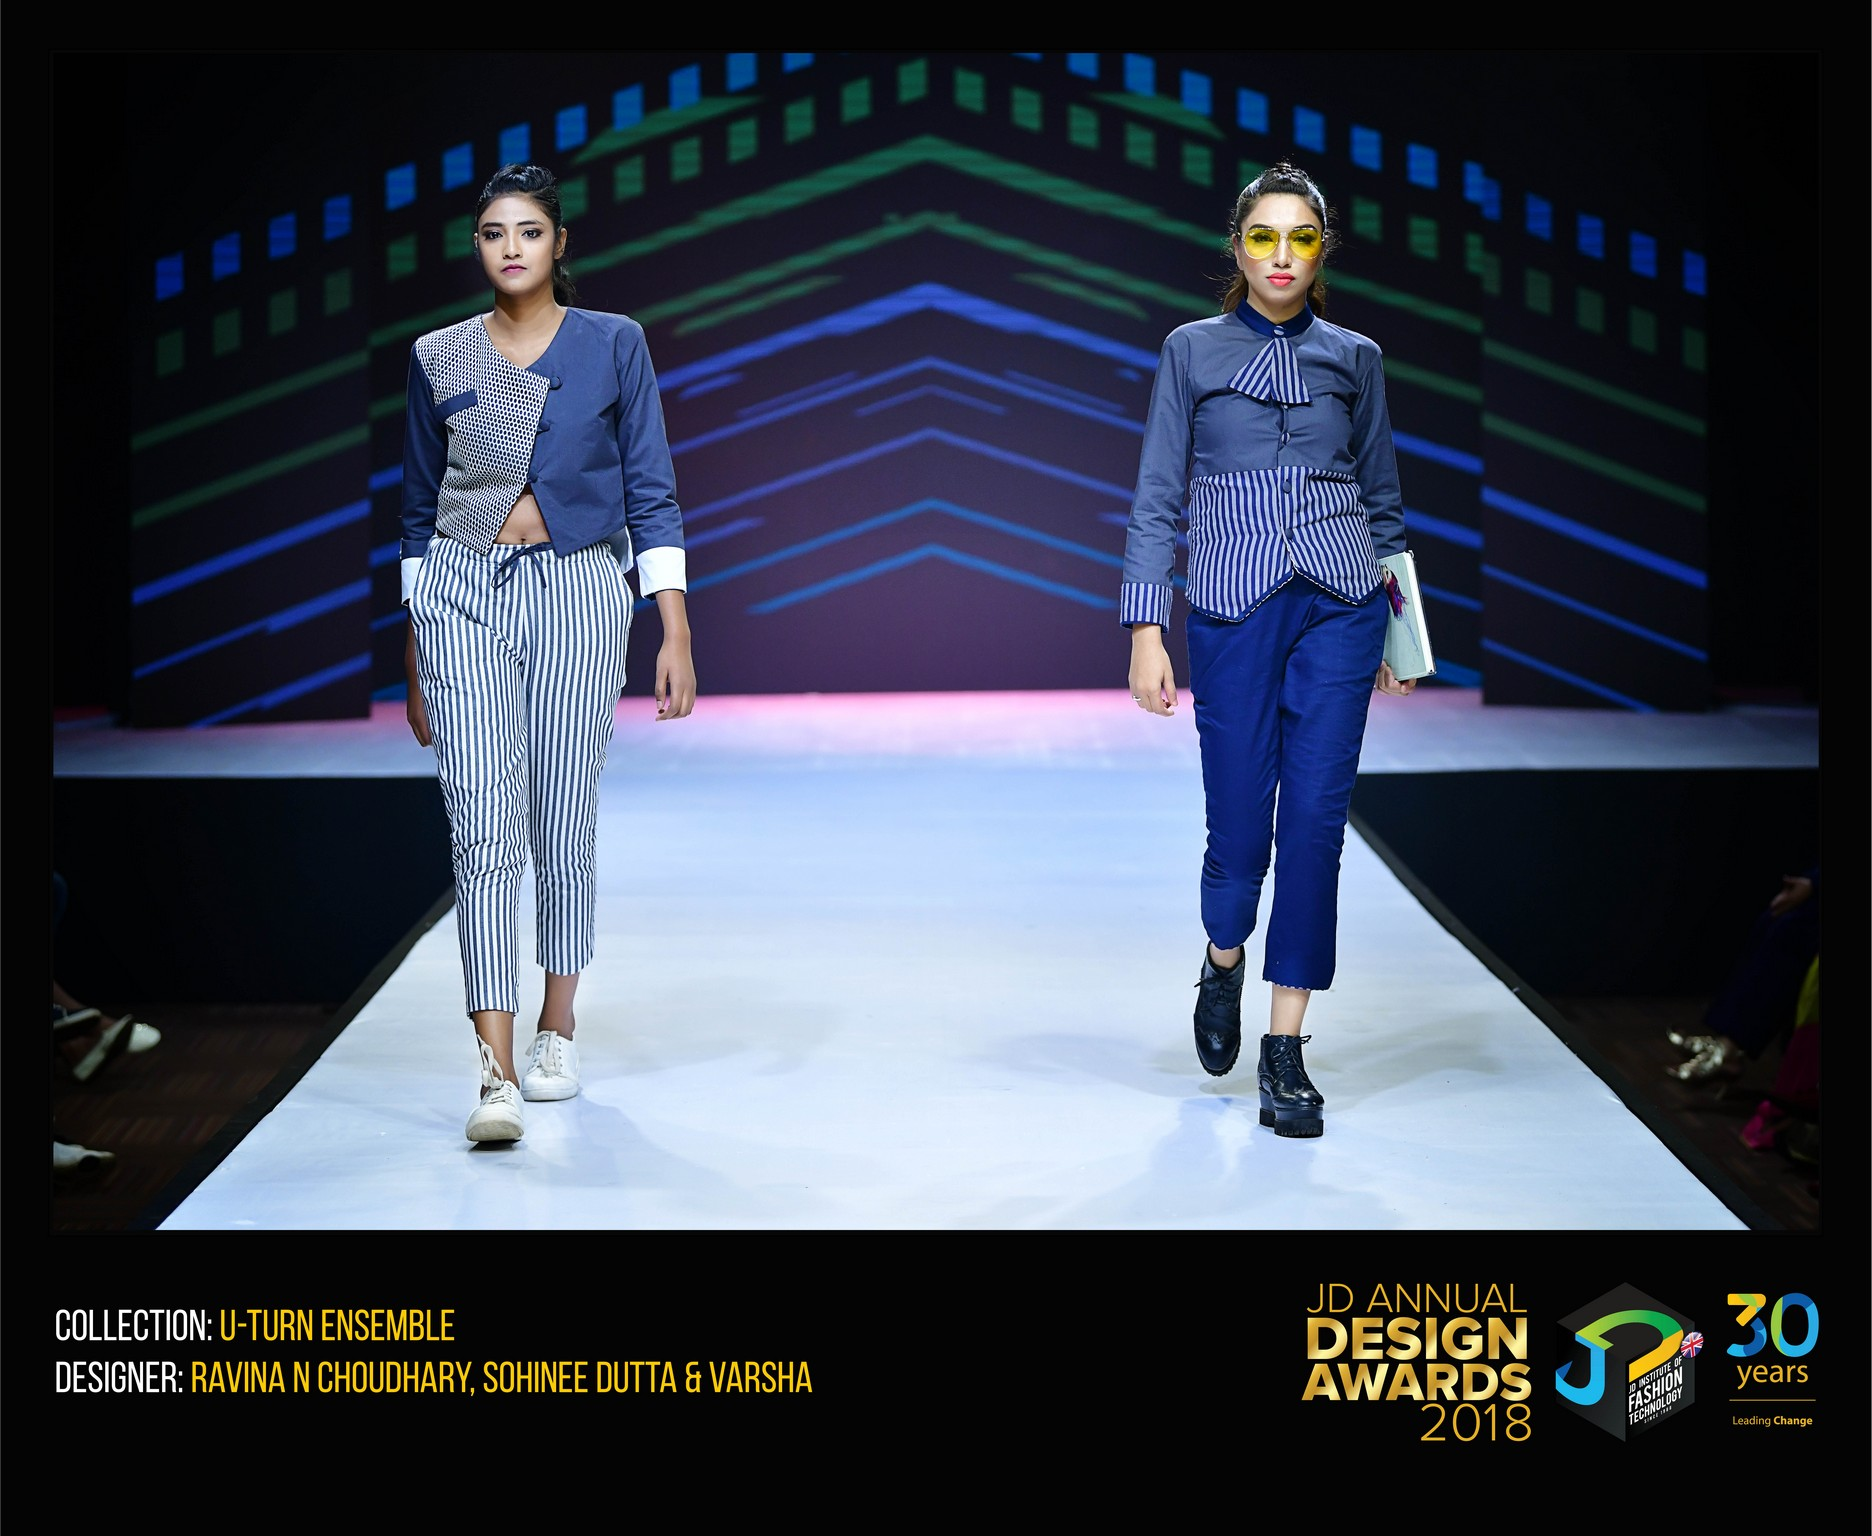 The U-turn ensemble – Change – JD Annual Design Awards 2018 | Designer: Sohinee, Ravina and Varsha | Photography : Jerin Nath (@jerin_nath) the u-turn ensemble – change – jd annual design awards 2018 The U-turn ensemble – Change – JD Annual Design Awards 2018 U TURN ENSEMBLE 6